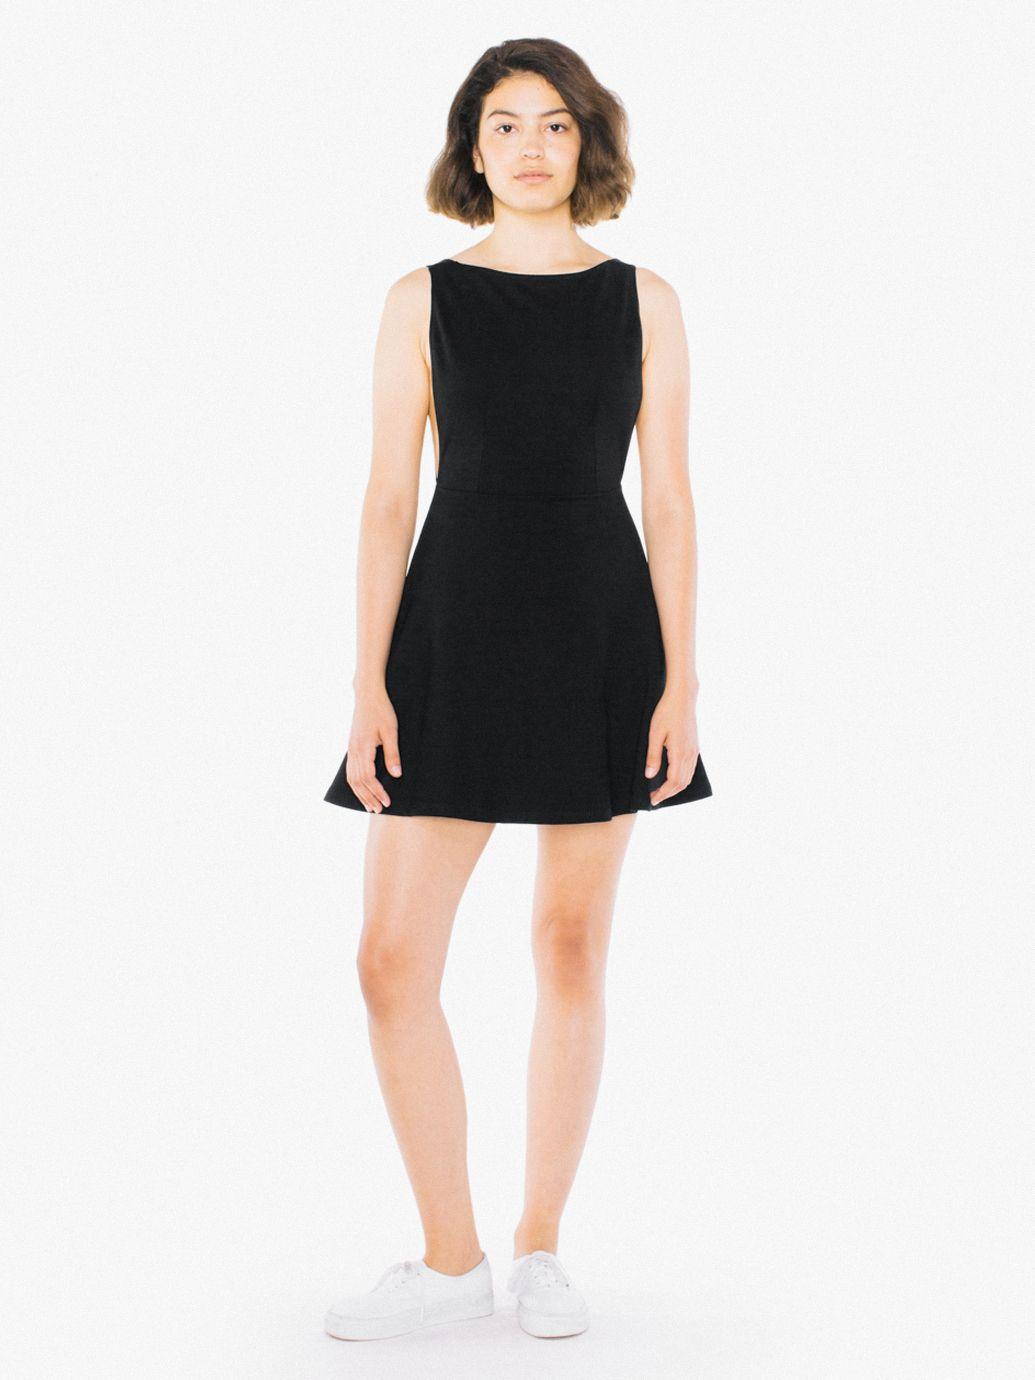 c25878842eedcc Ponte Sleeveless Skater Dress